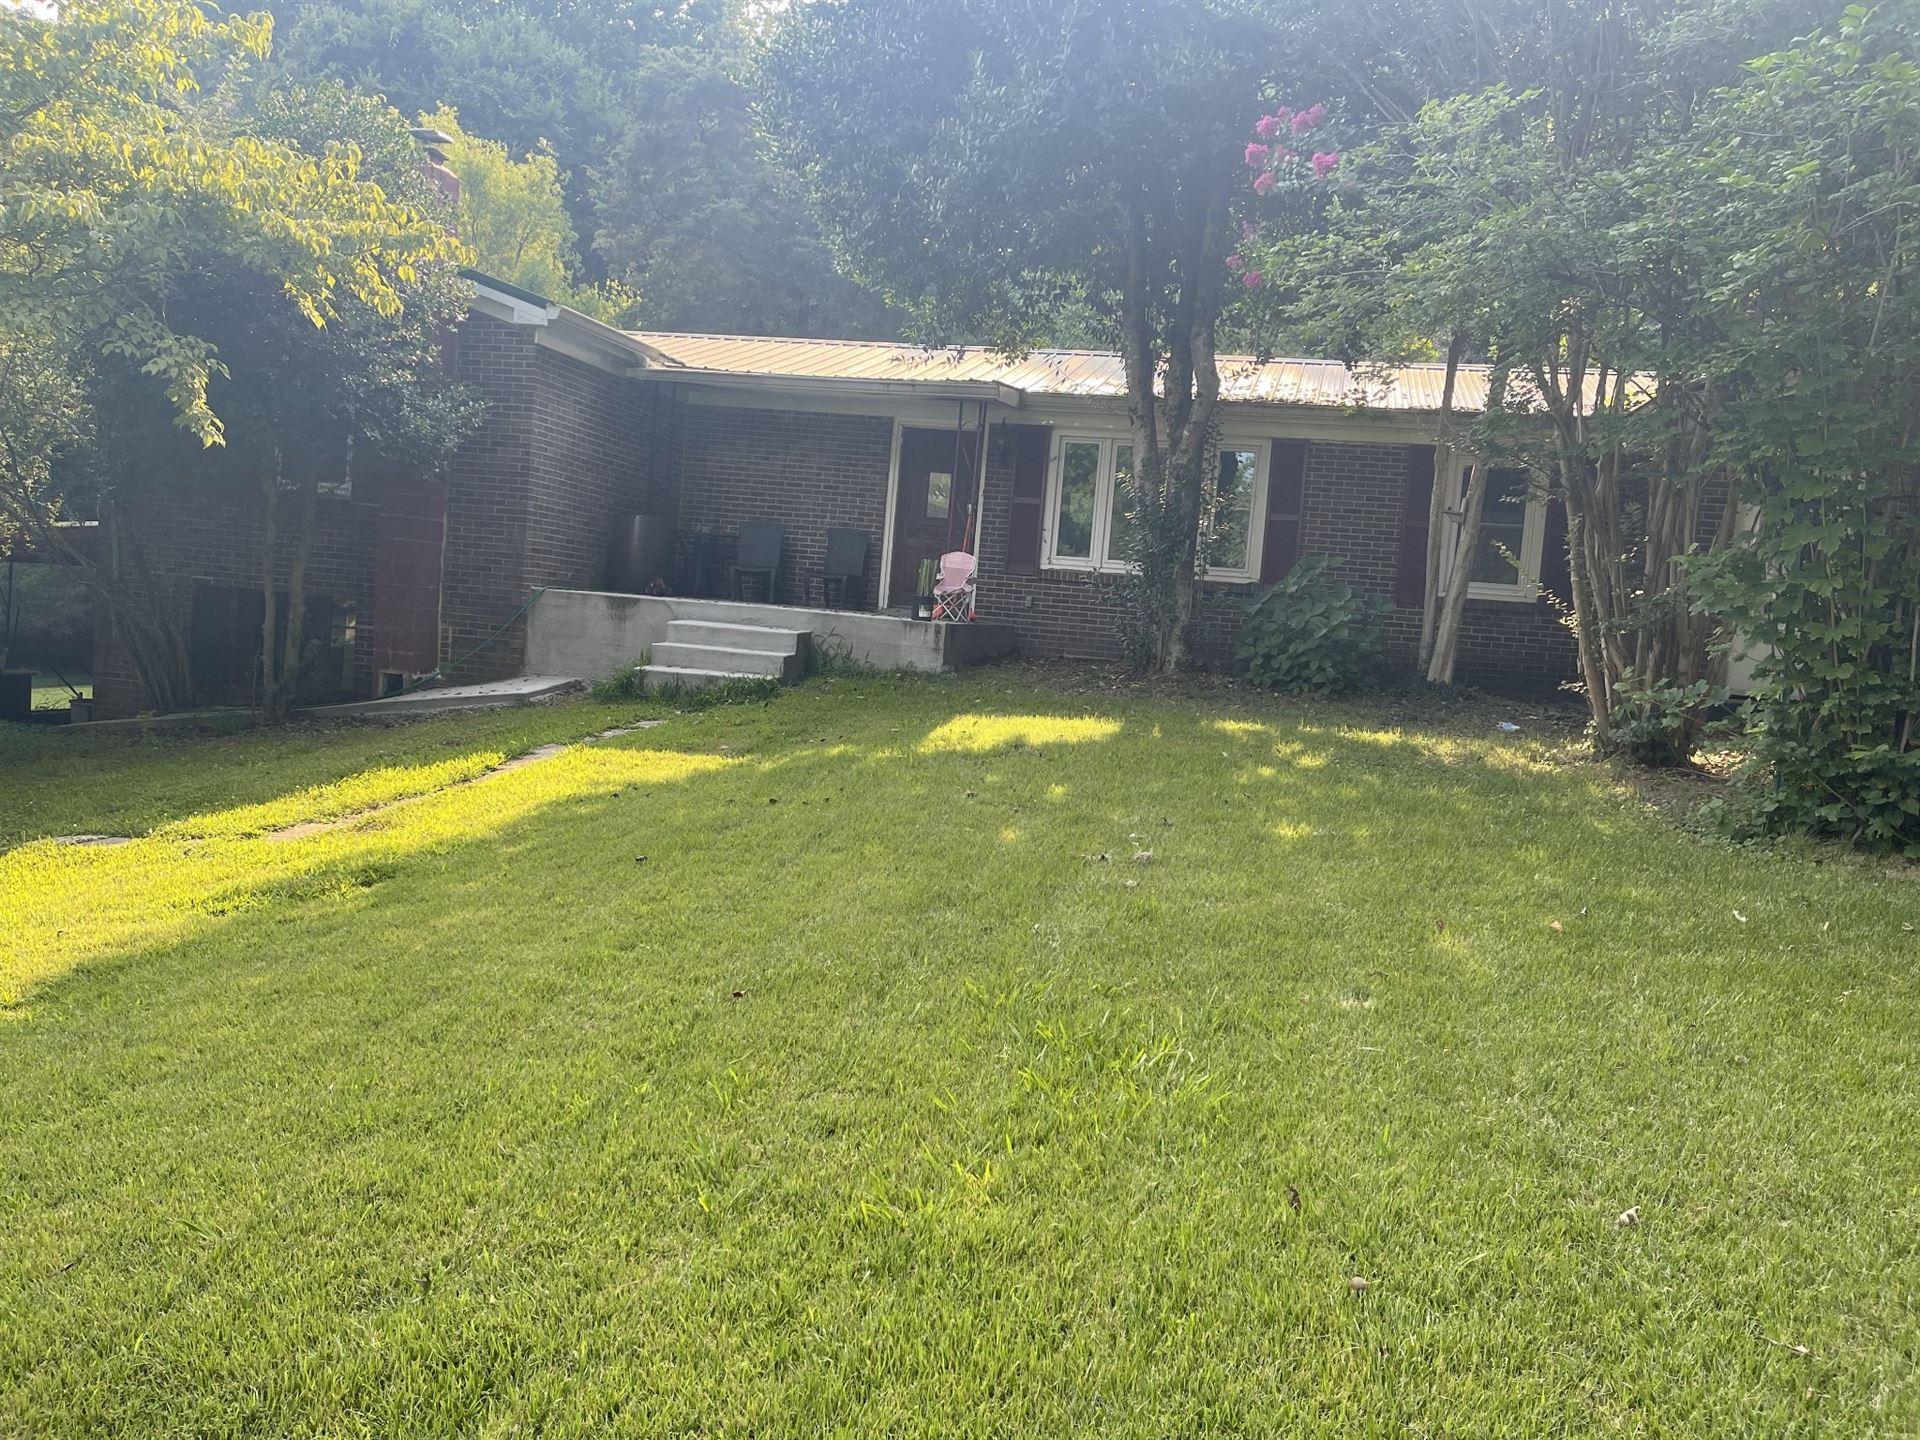 2072 Sanders Rd, Clarksville, TN 37043 - MLS#: 2275401